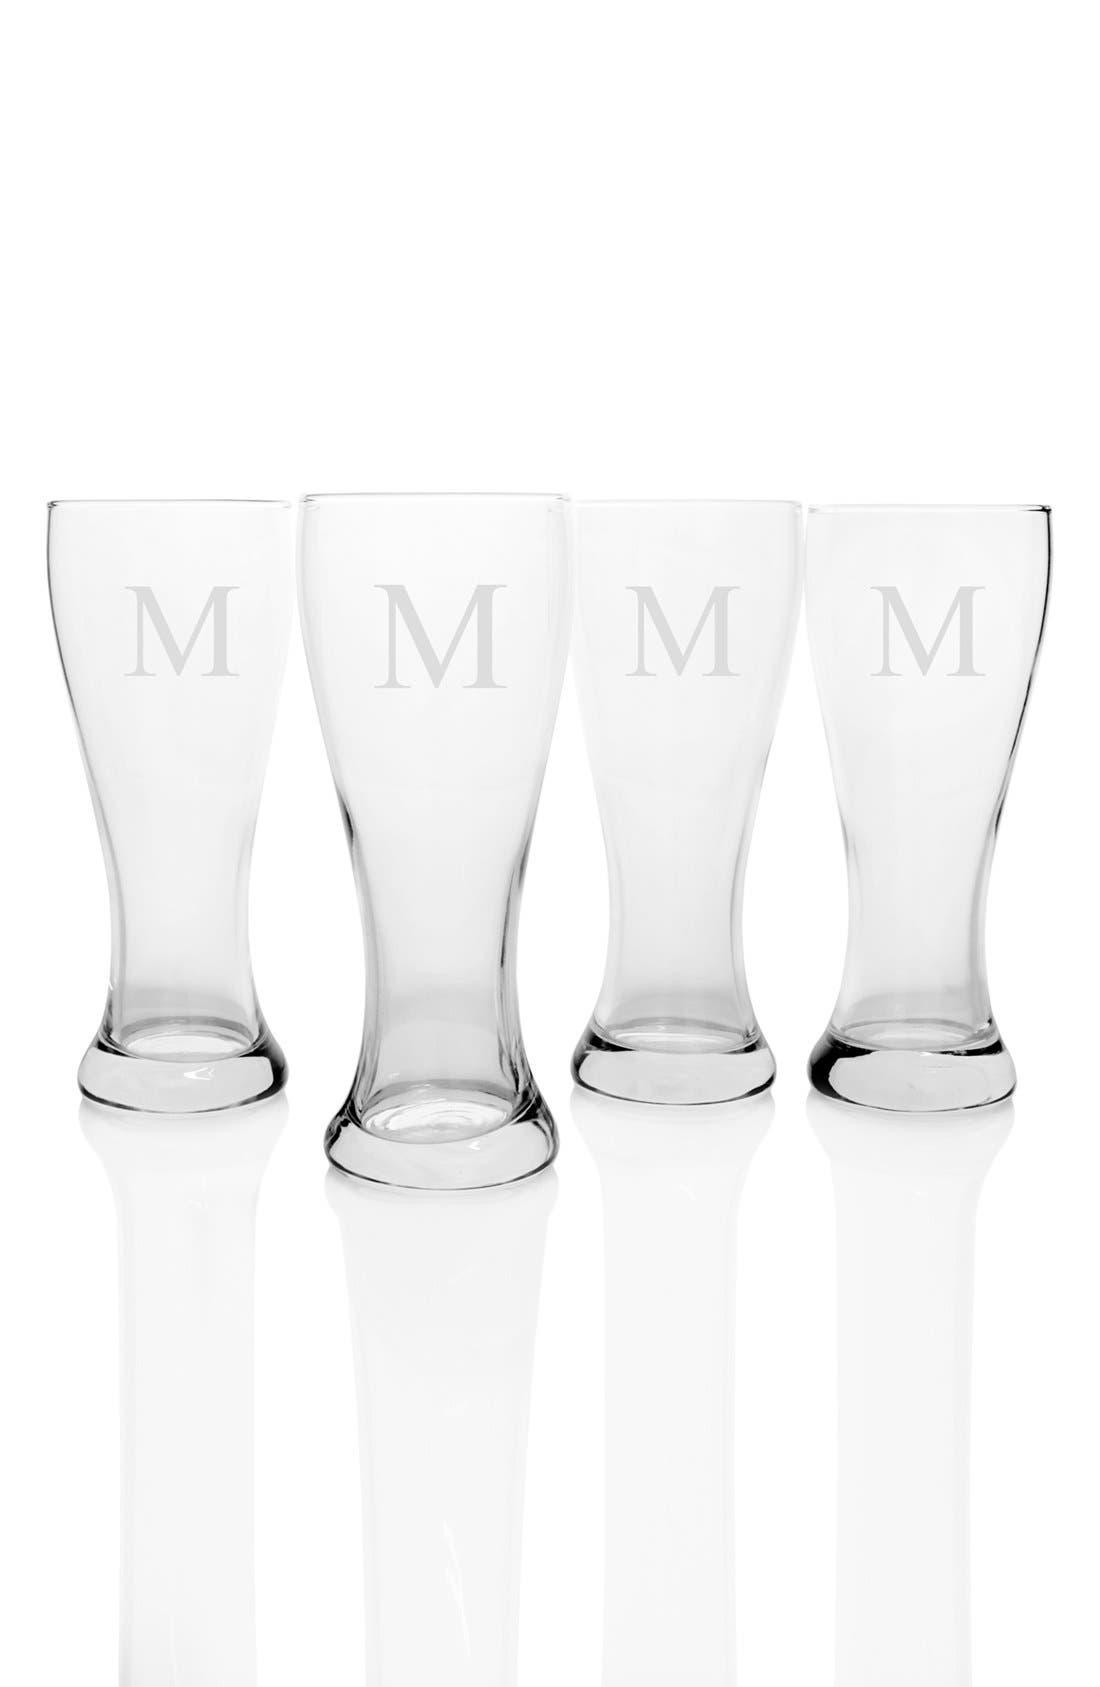 Monogram Pilsner Glasses,                             Alternate thumbnail 2, color,                             Clear-M